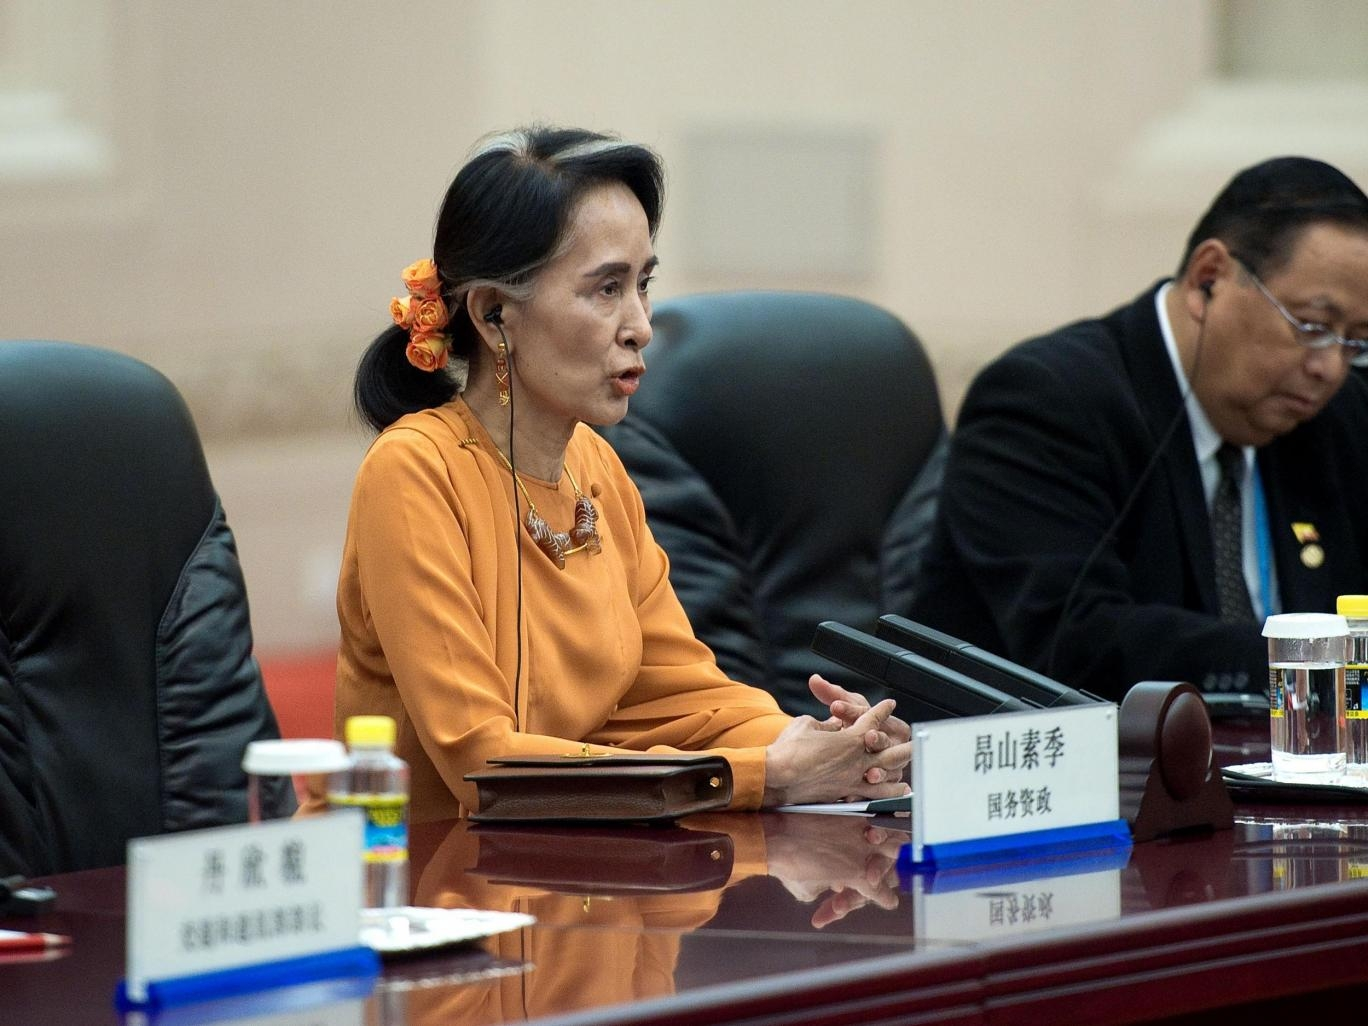 400k sign pro-Rohingya petition to strip Suu Kyi of Nobel Prize